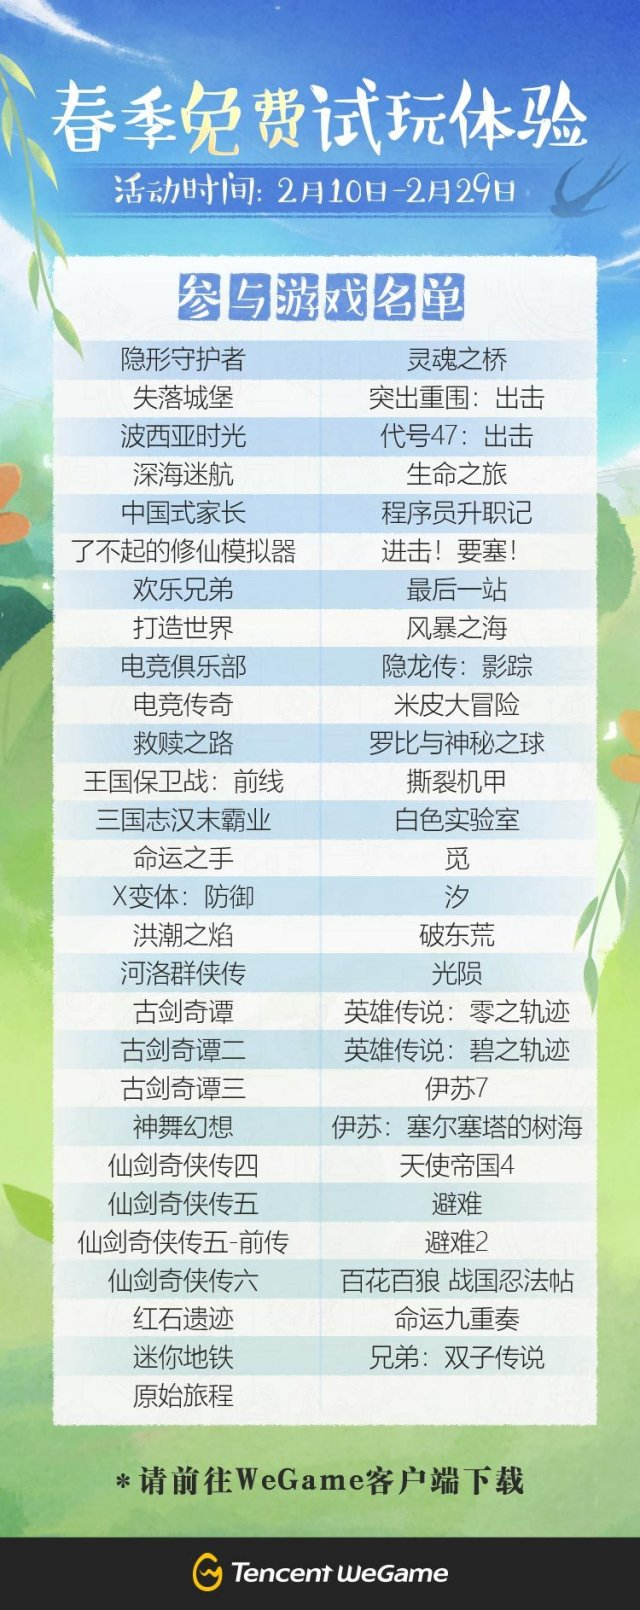 WeGame宣布55款单机游戏开启限时免费试玩两小时活动